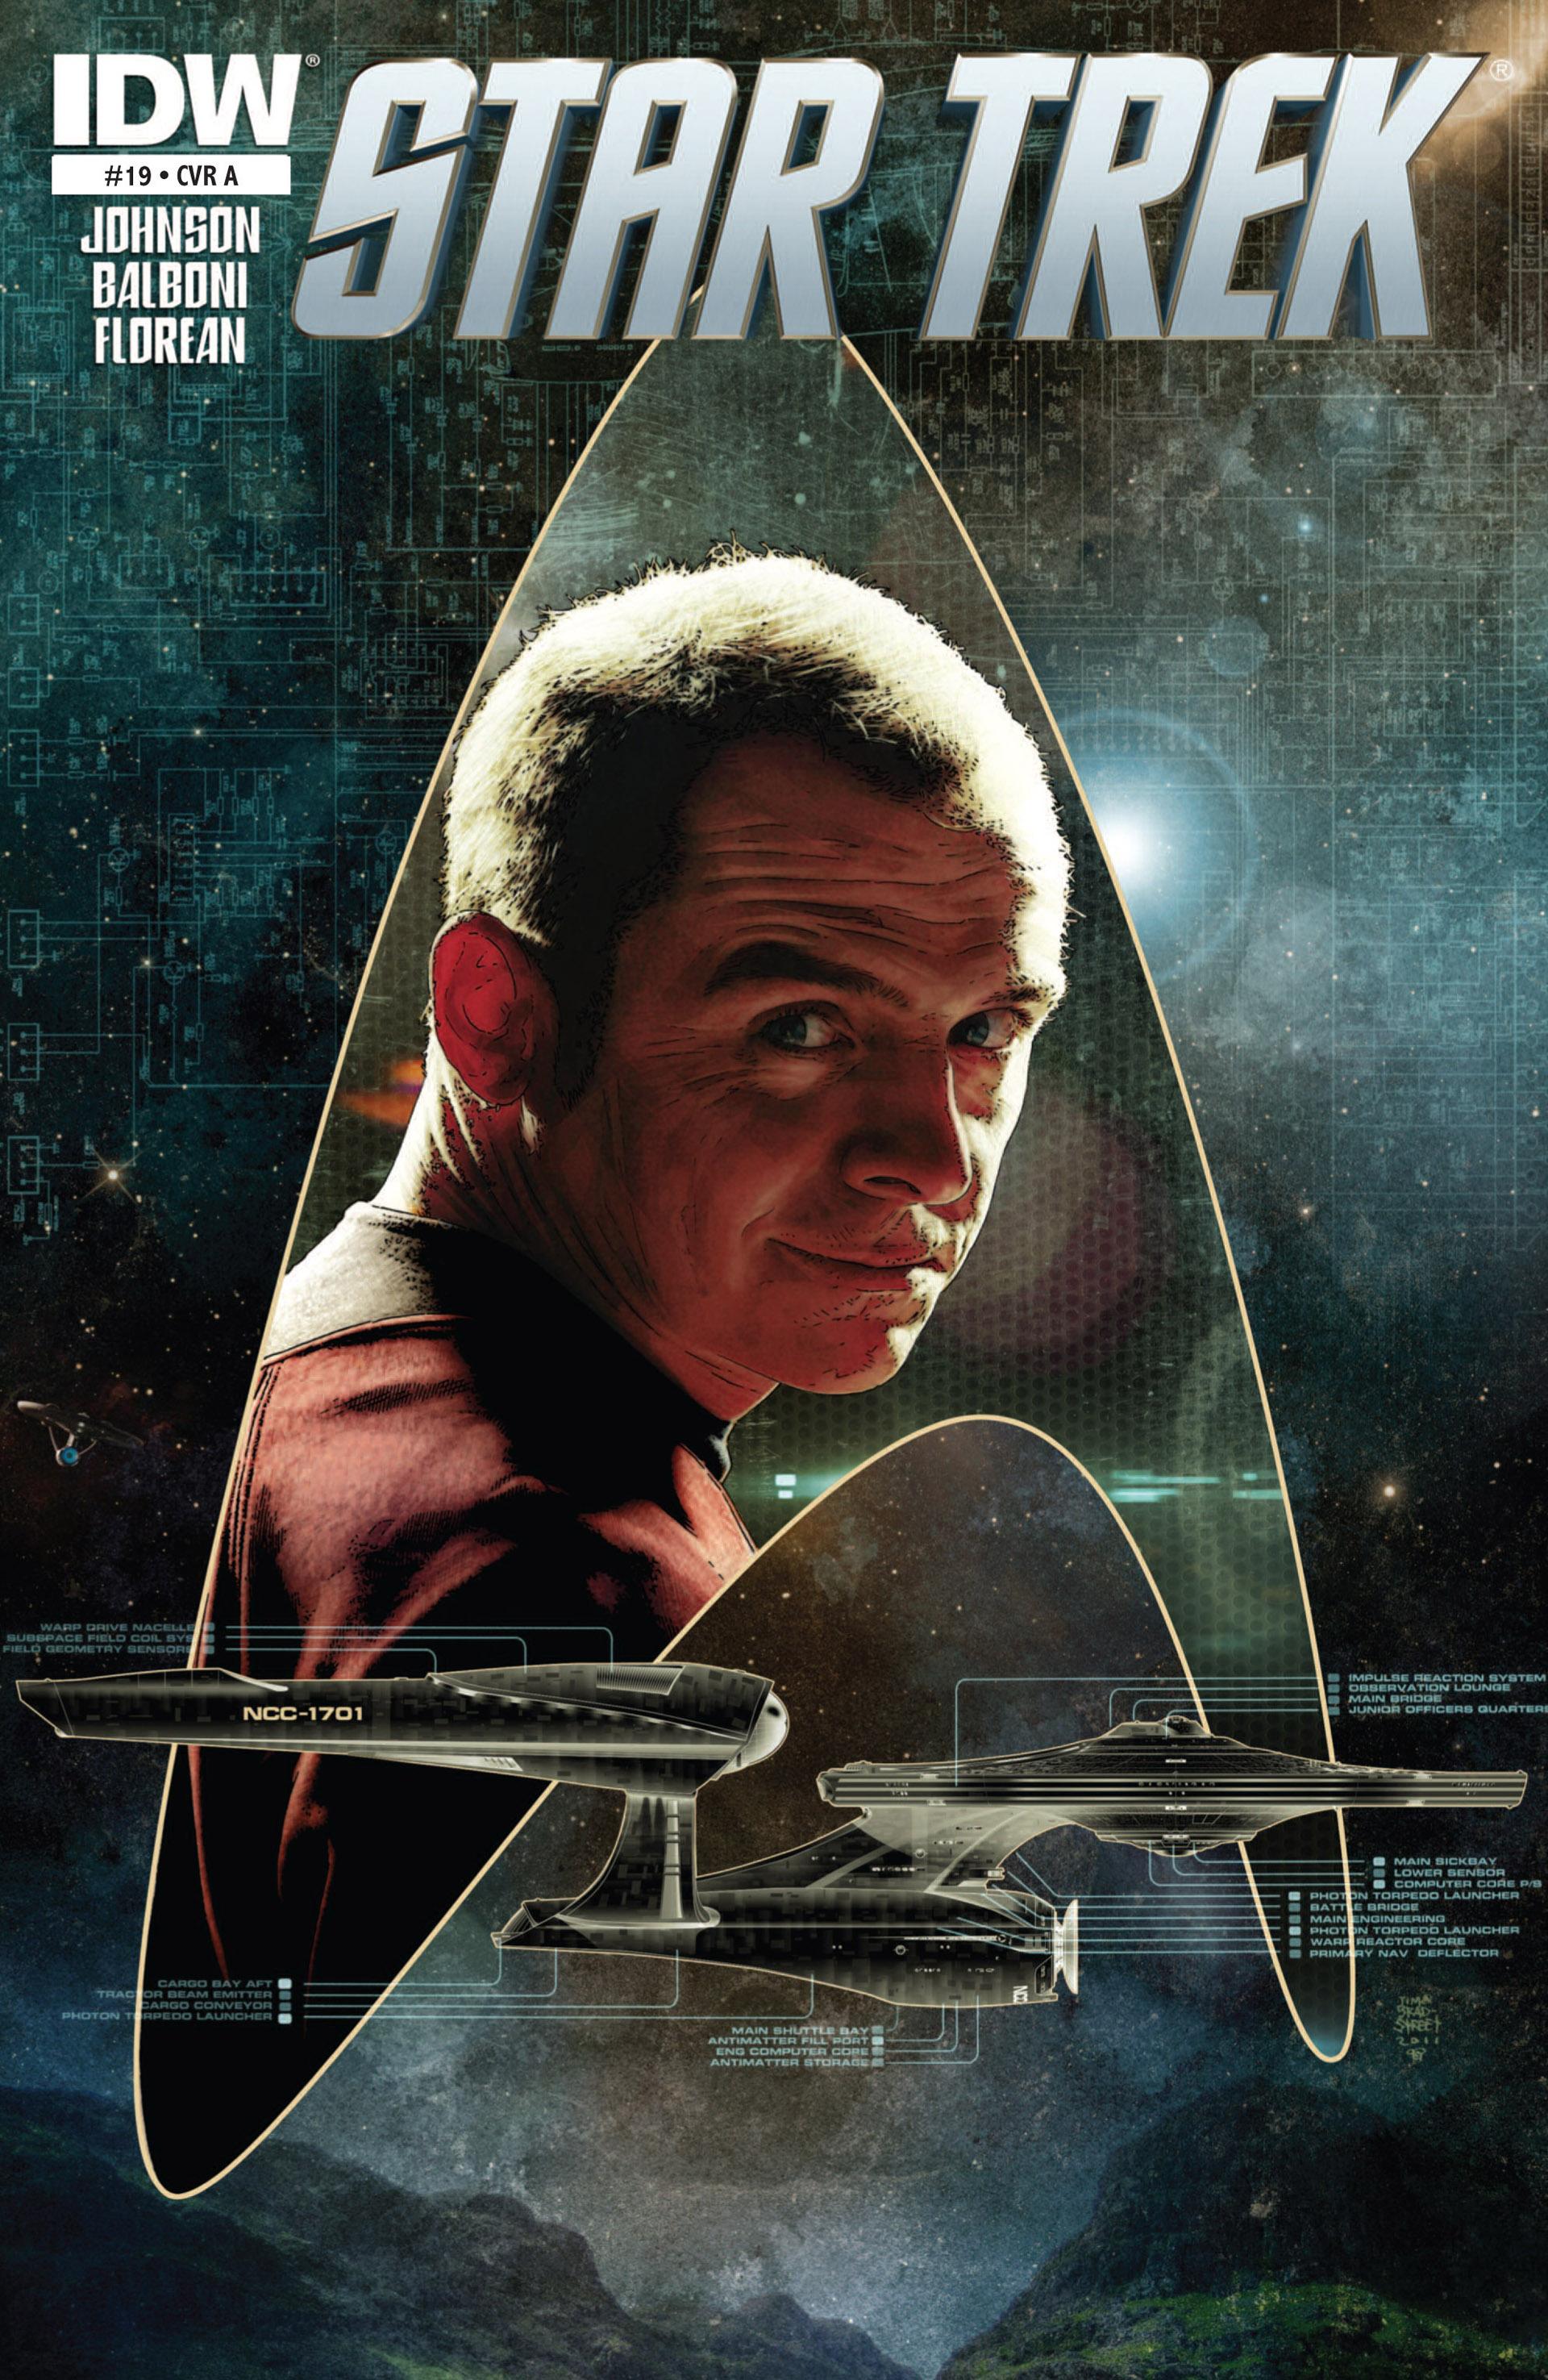 File:IDW Star Trek 19.jpg